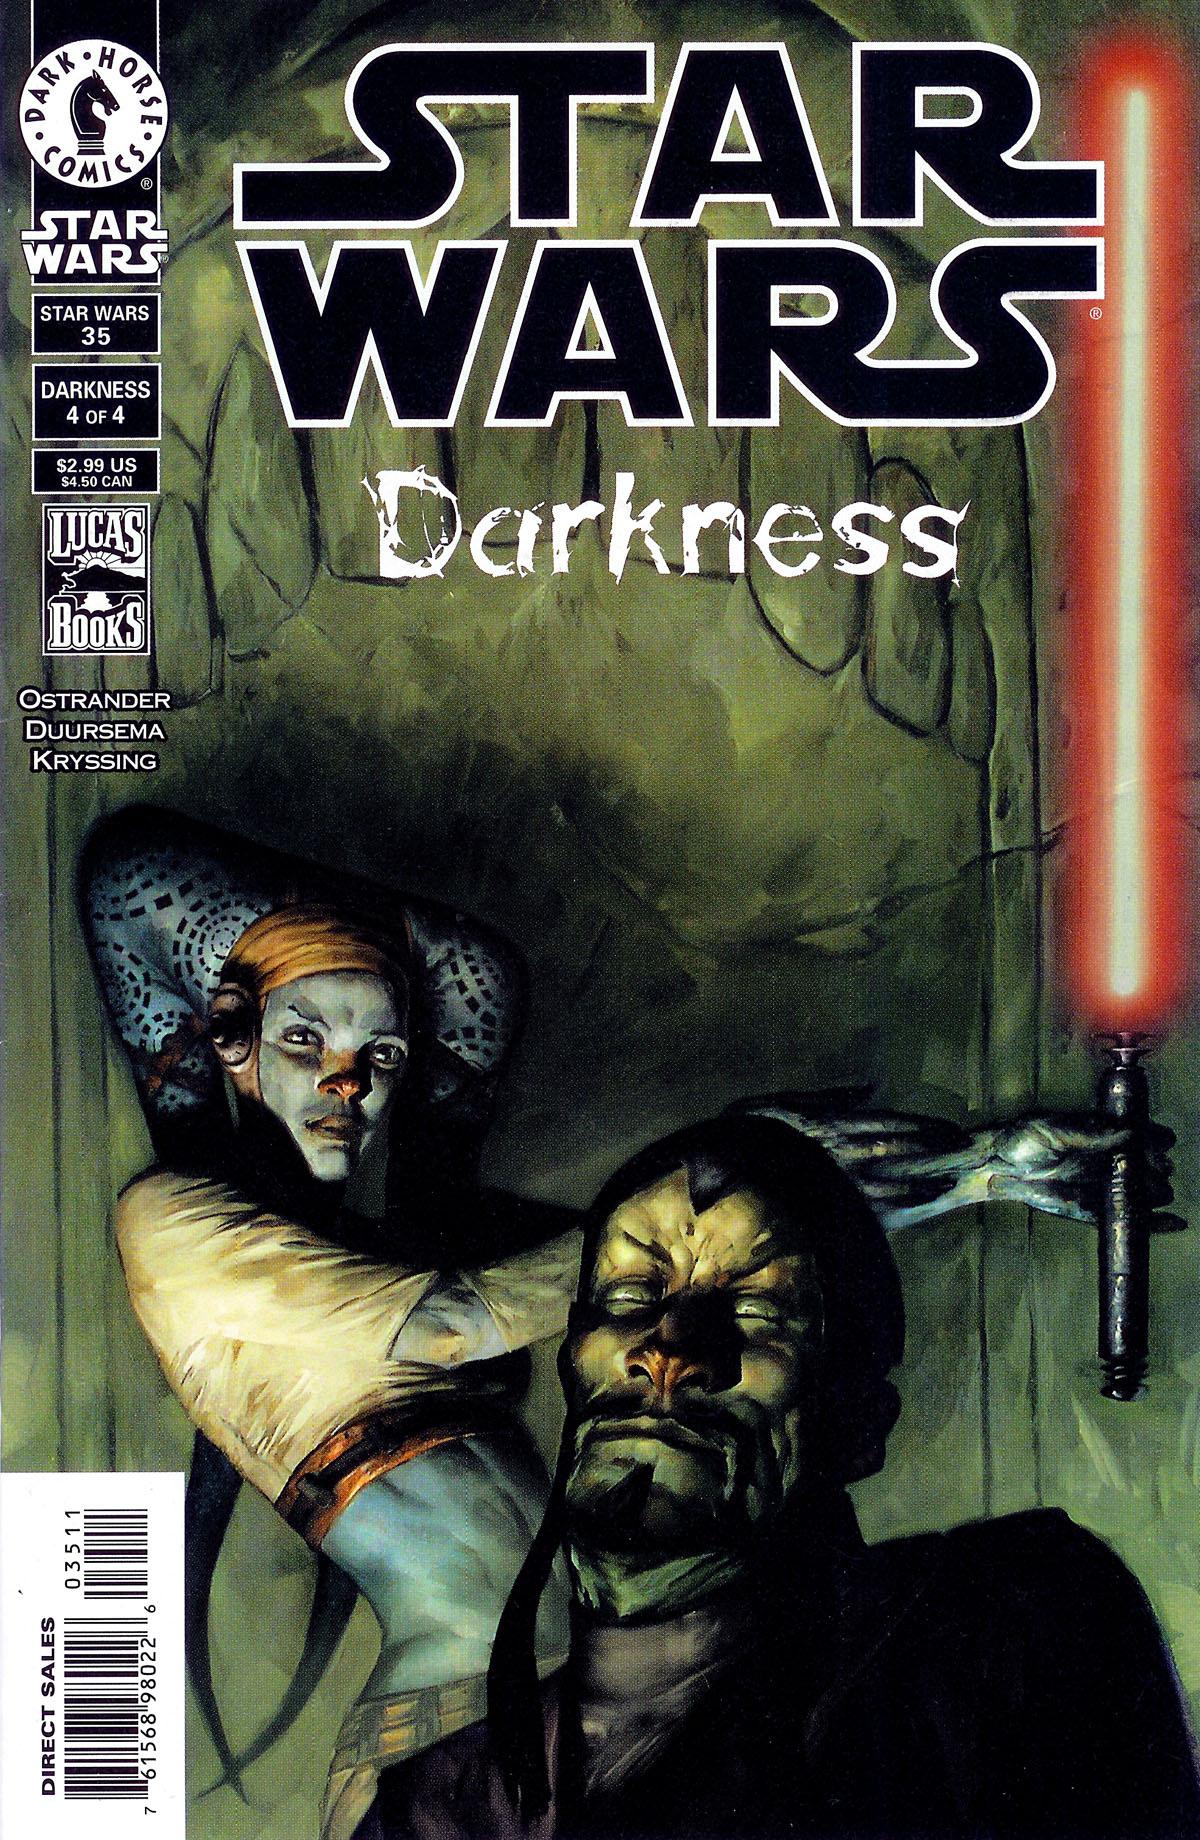 Image result for star wars darkness